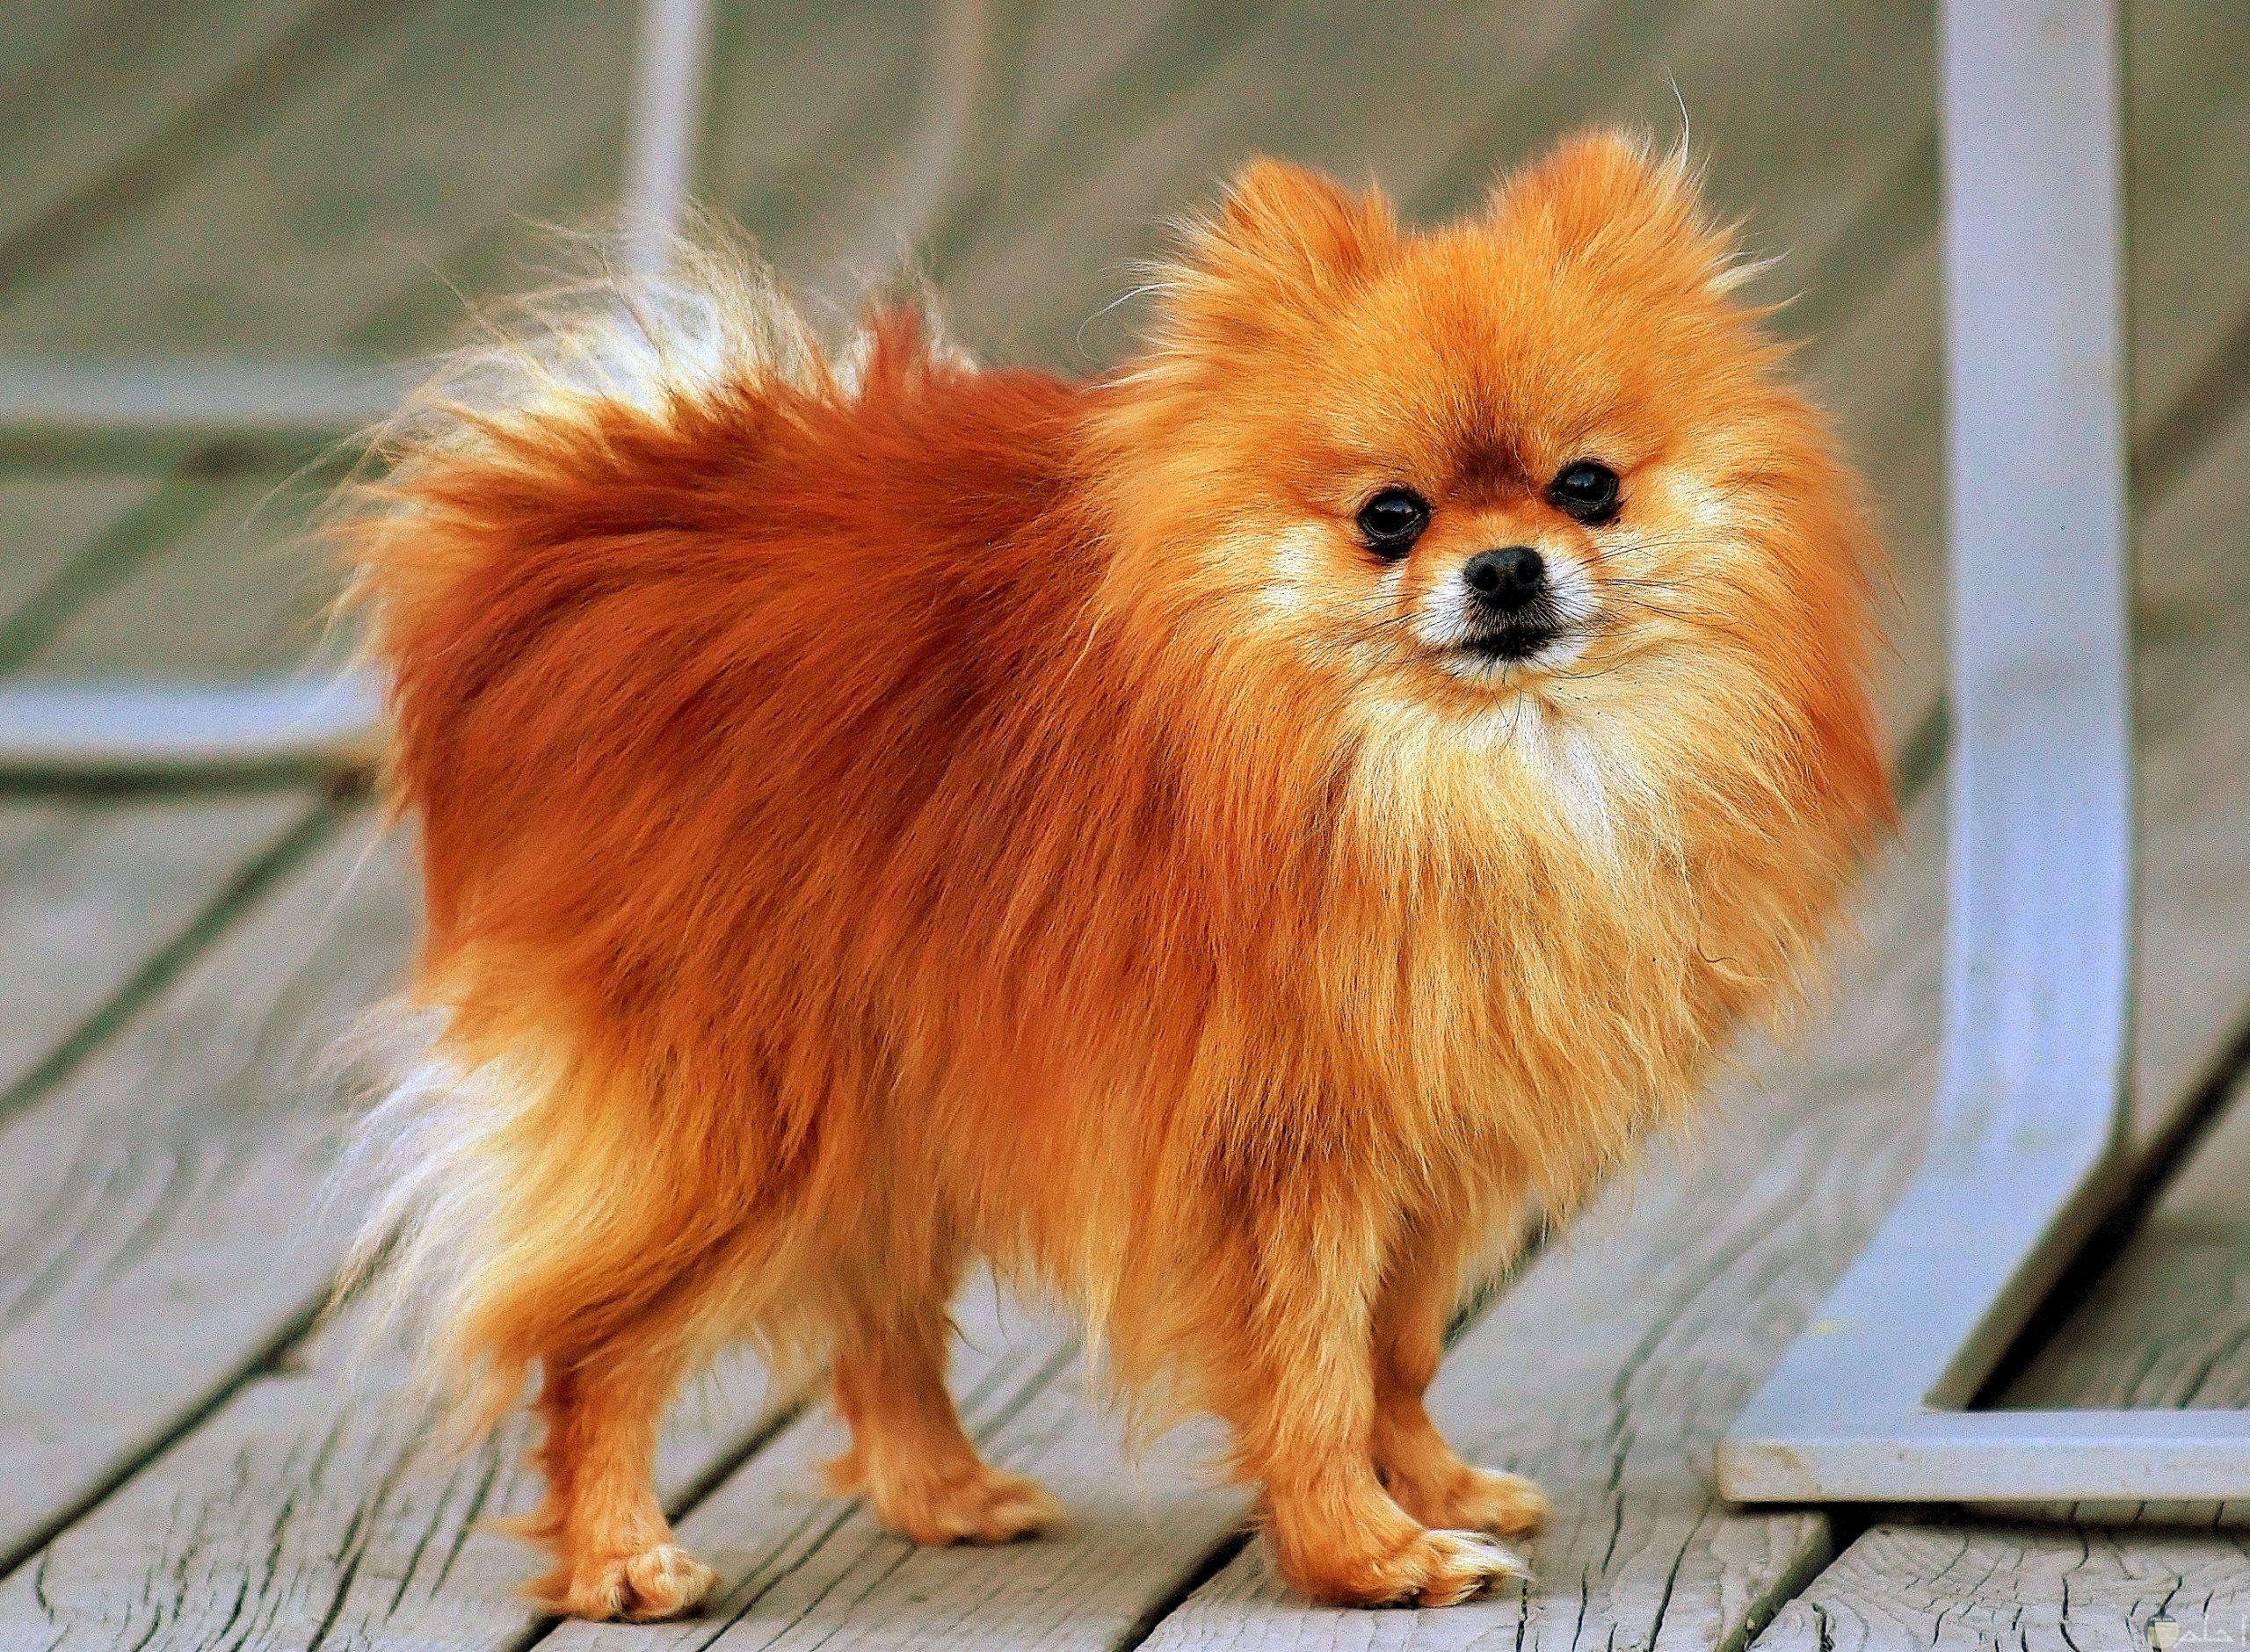 Pomeranian-كلب بوميرينيان صغير